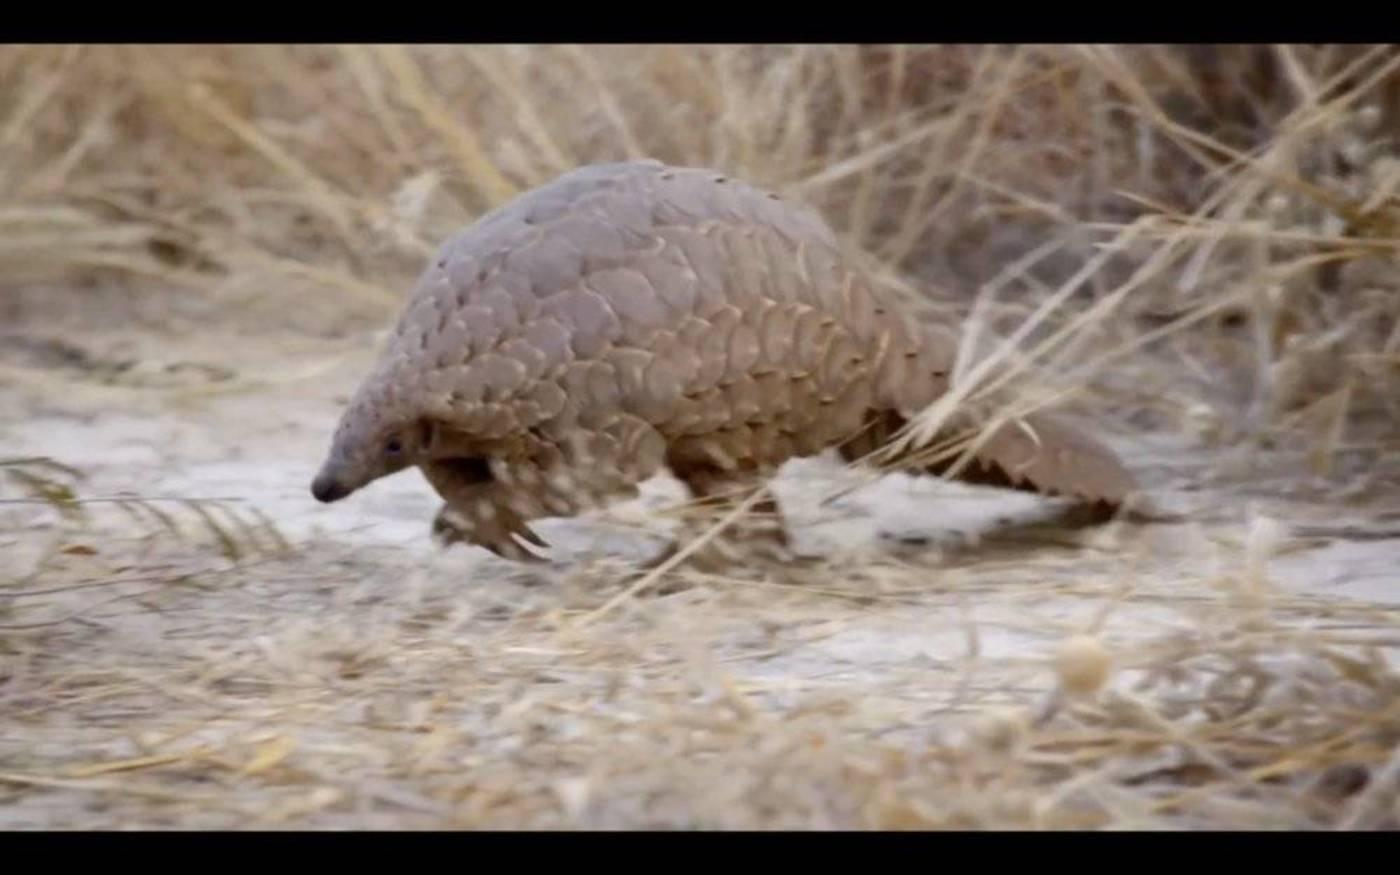 BBC纪录片《穿山甲:被捕杀最多的动物》截图。